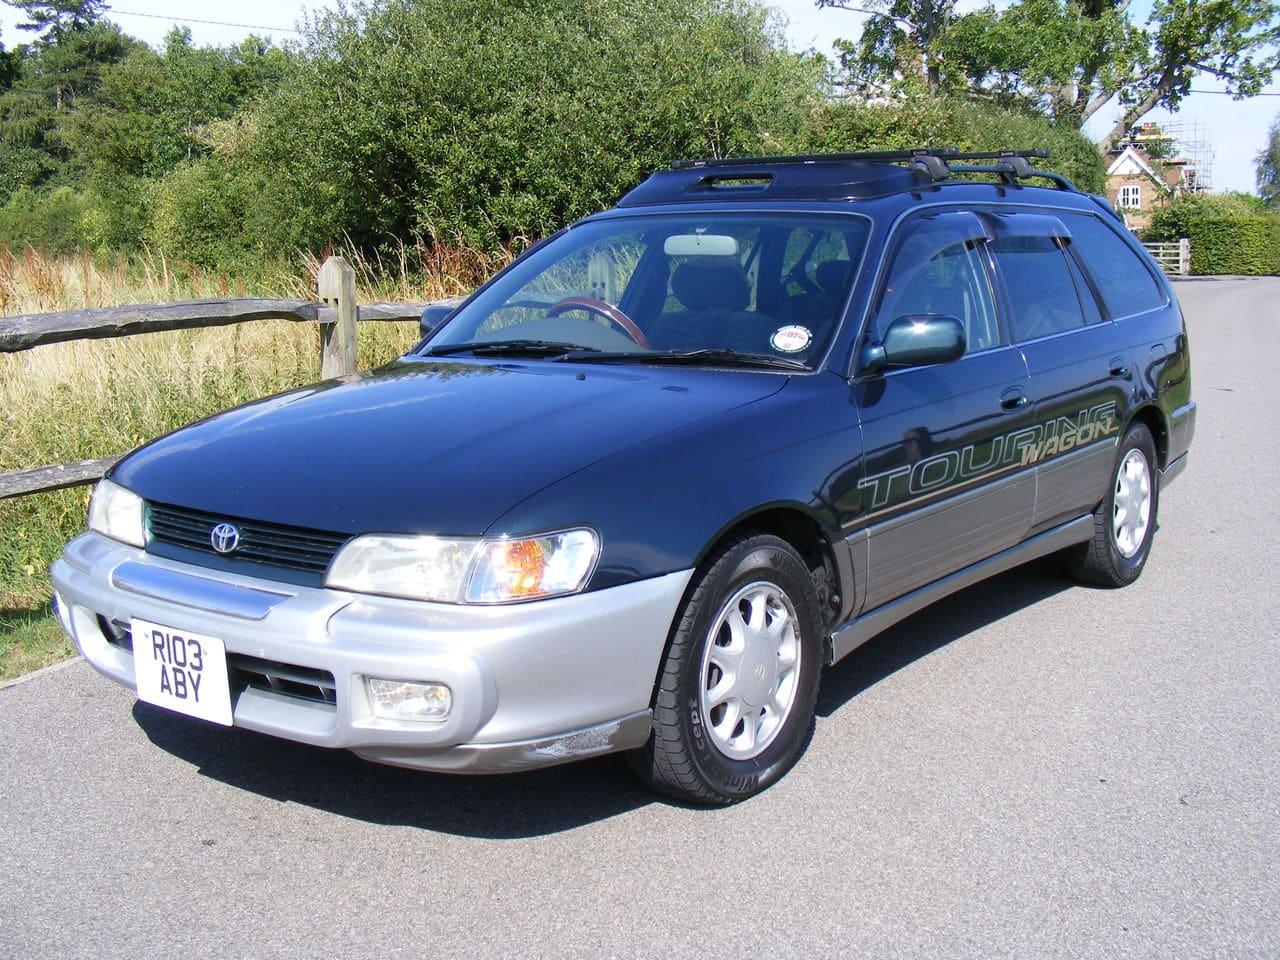 Toyota Corolla 1.6 family car Picture_2944